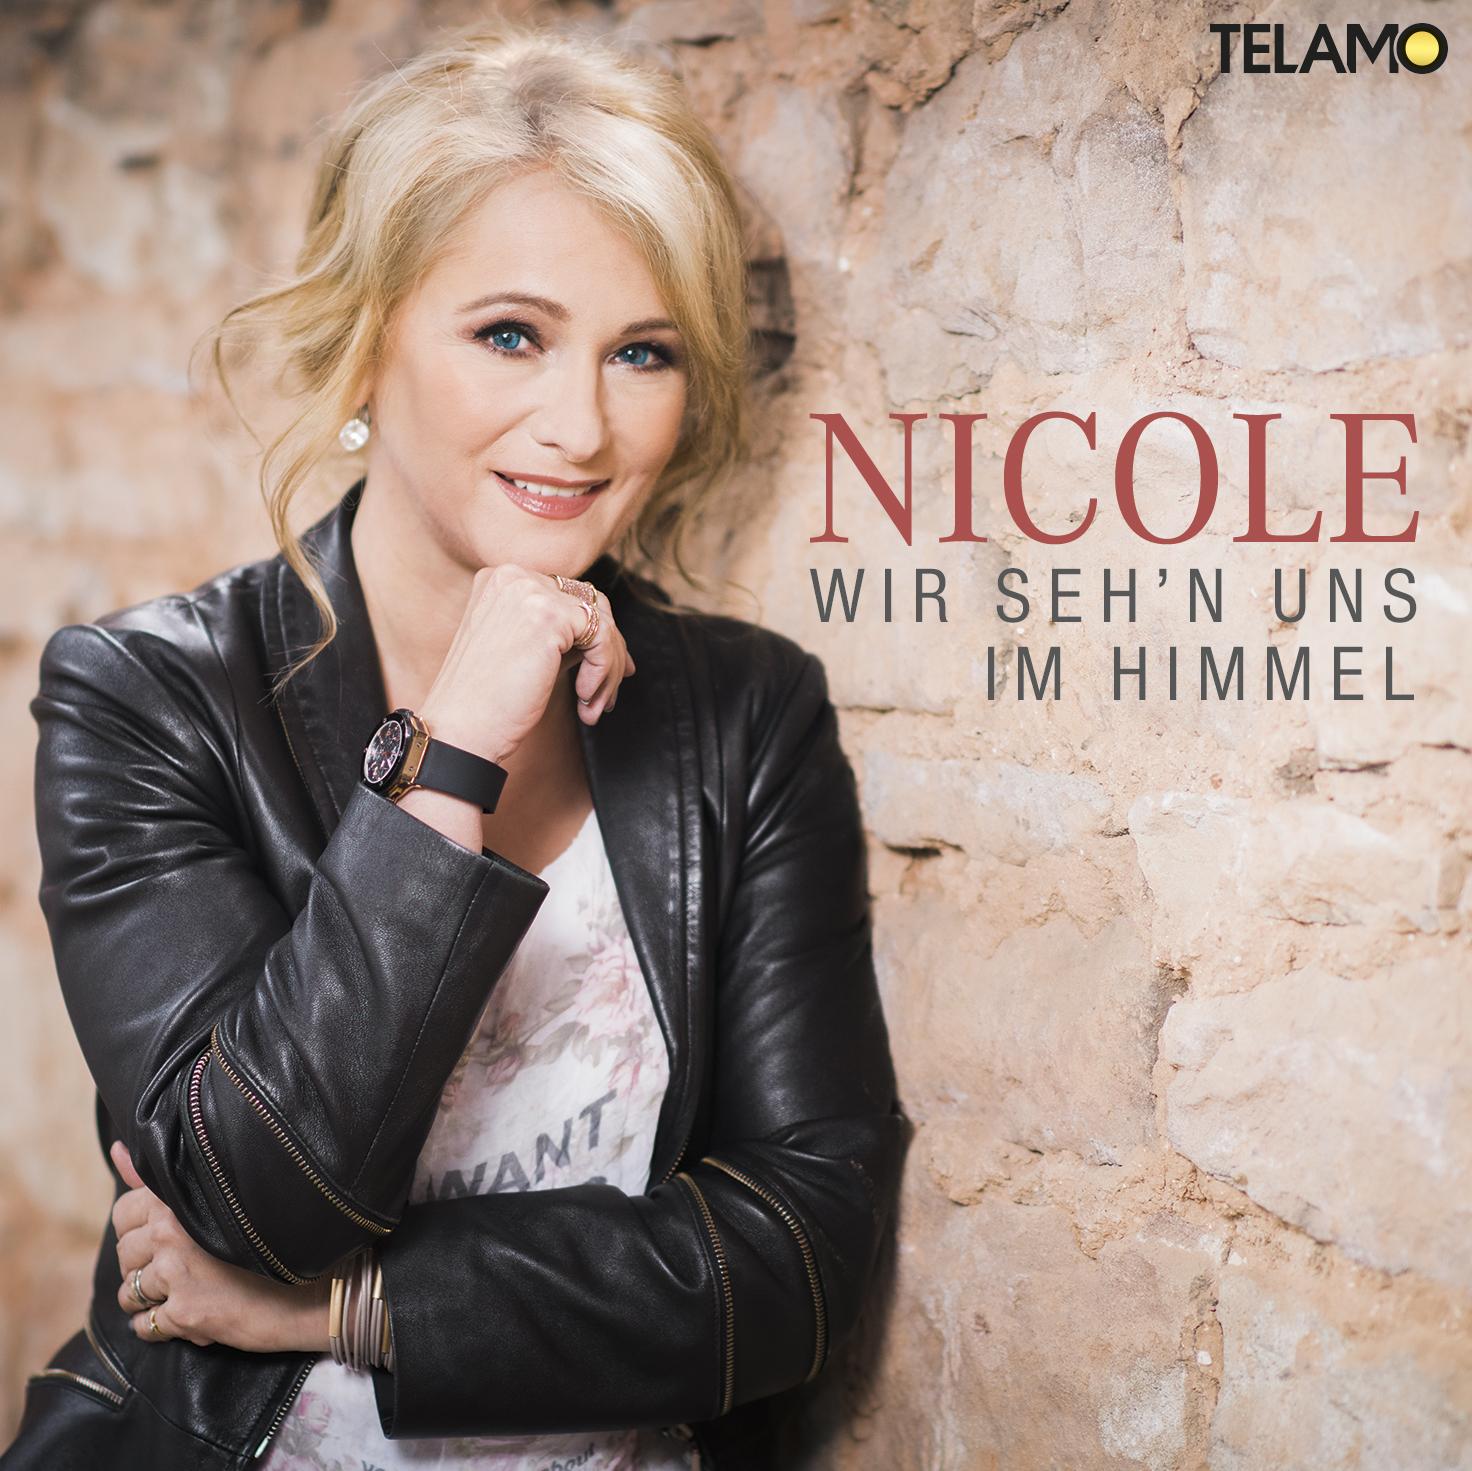 nicole-wir-sehn-uns-im-himmel-neues-album